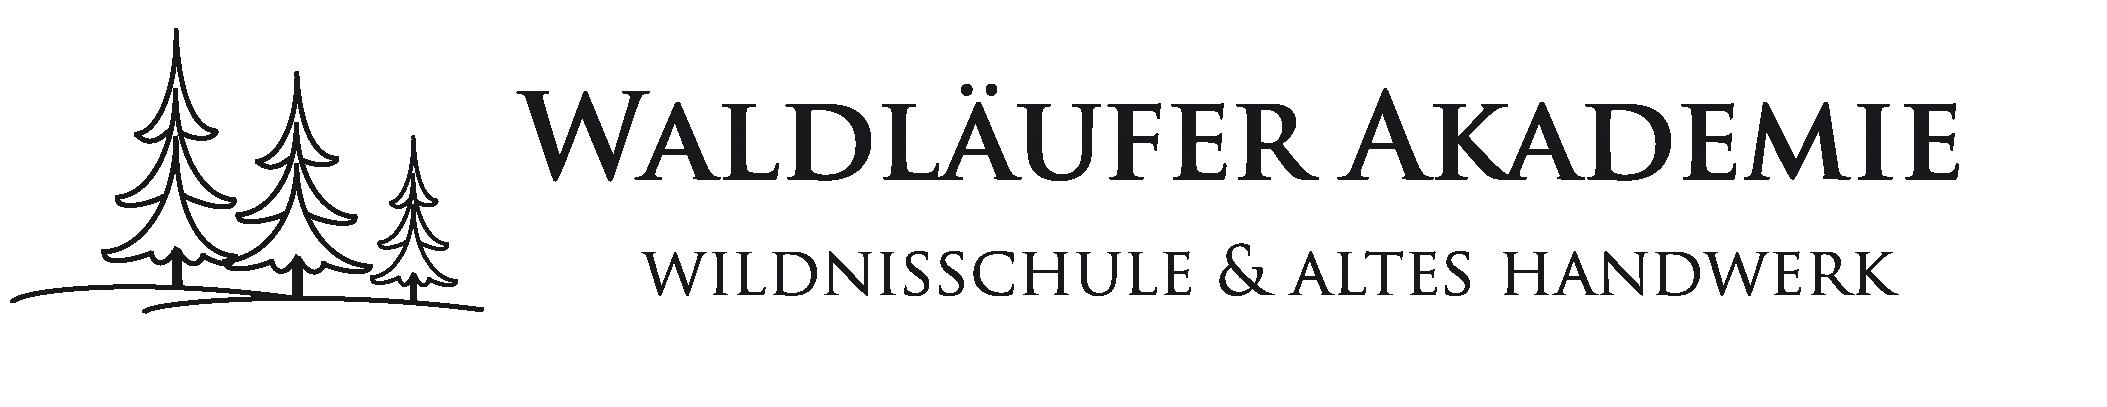 waldläufer-akademie.de